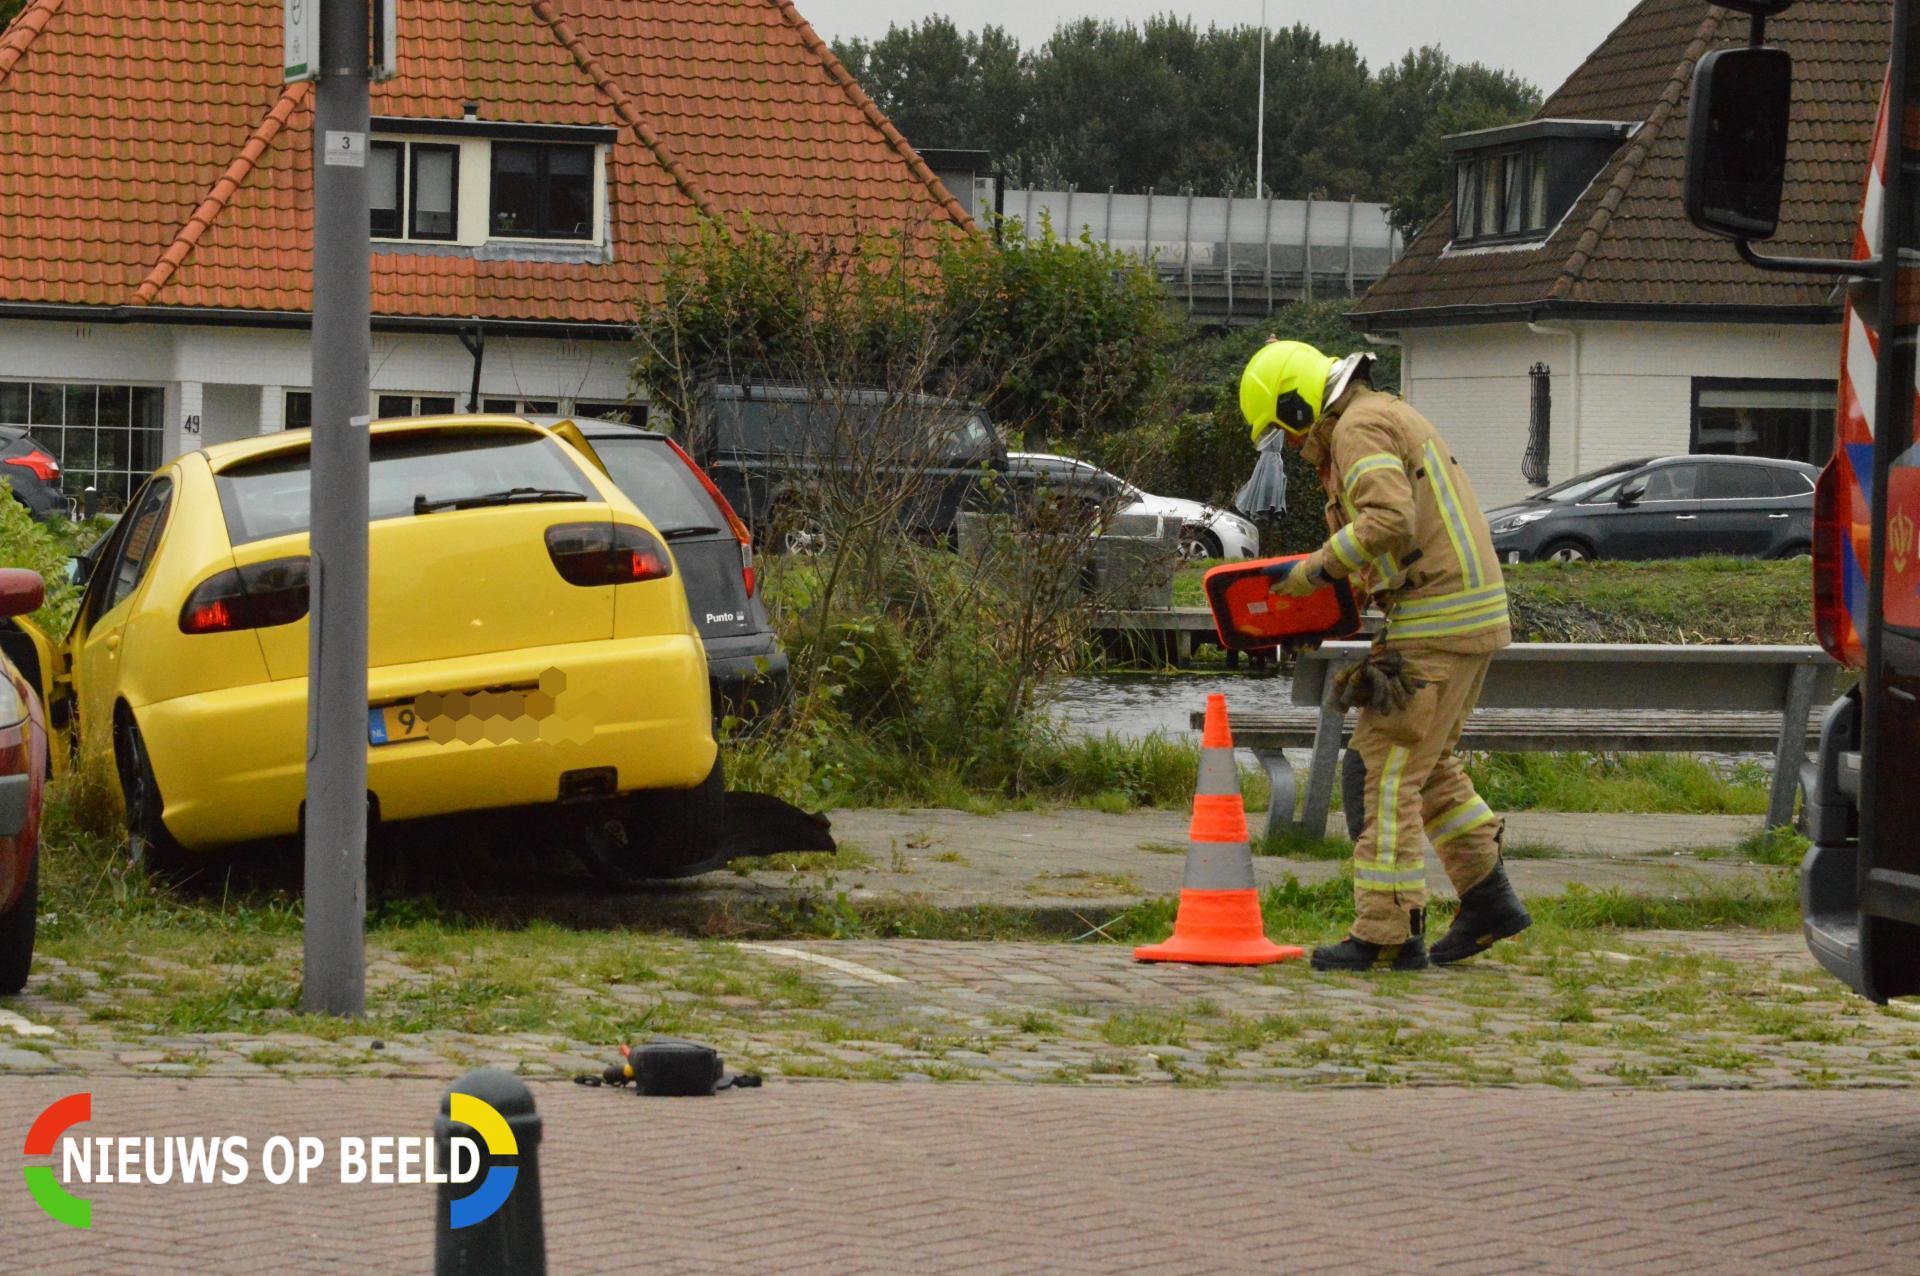 Flinke schade na botsing tussen twee auto's Prins Bernhardkade Rotterdam